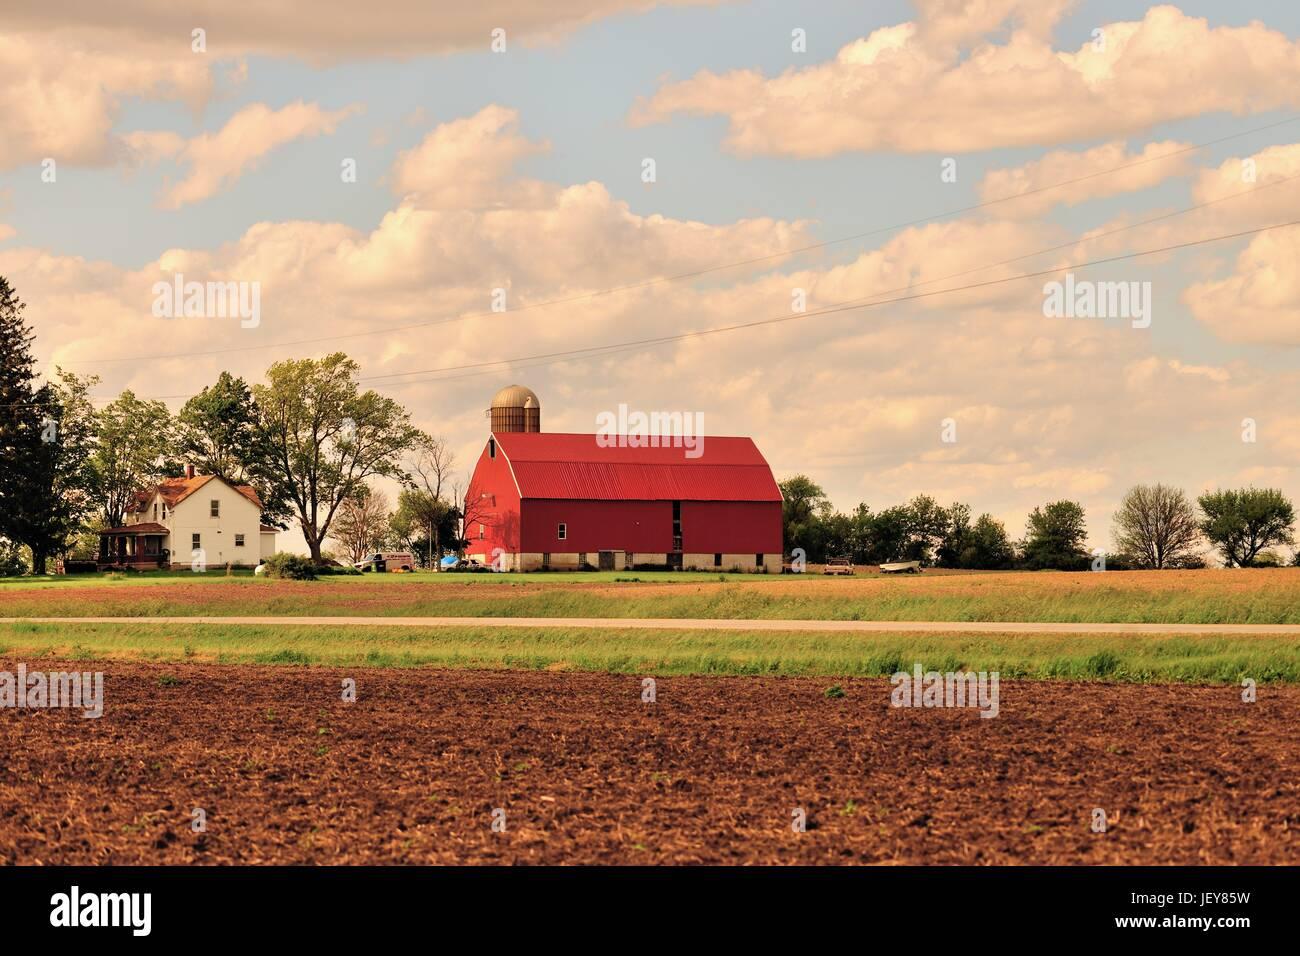 Red barn and farmhouse near tilled fields. Burlington, Illinois, USA - Stock Image